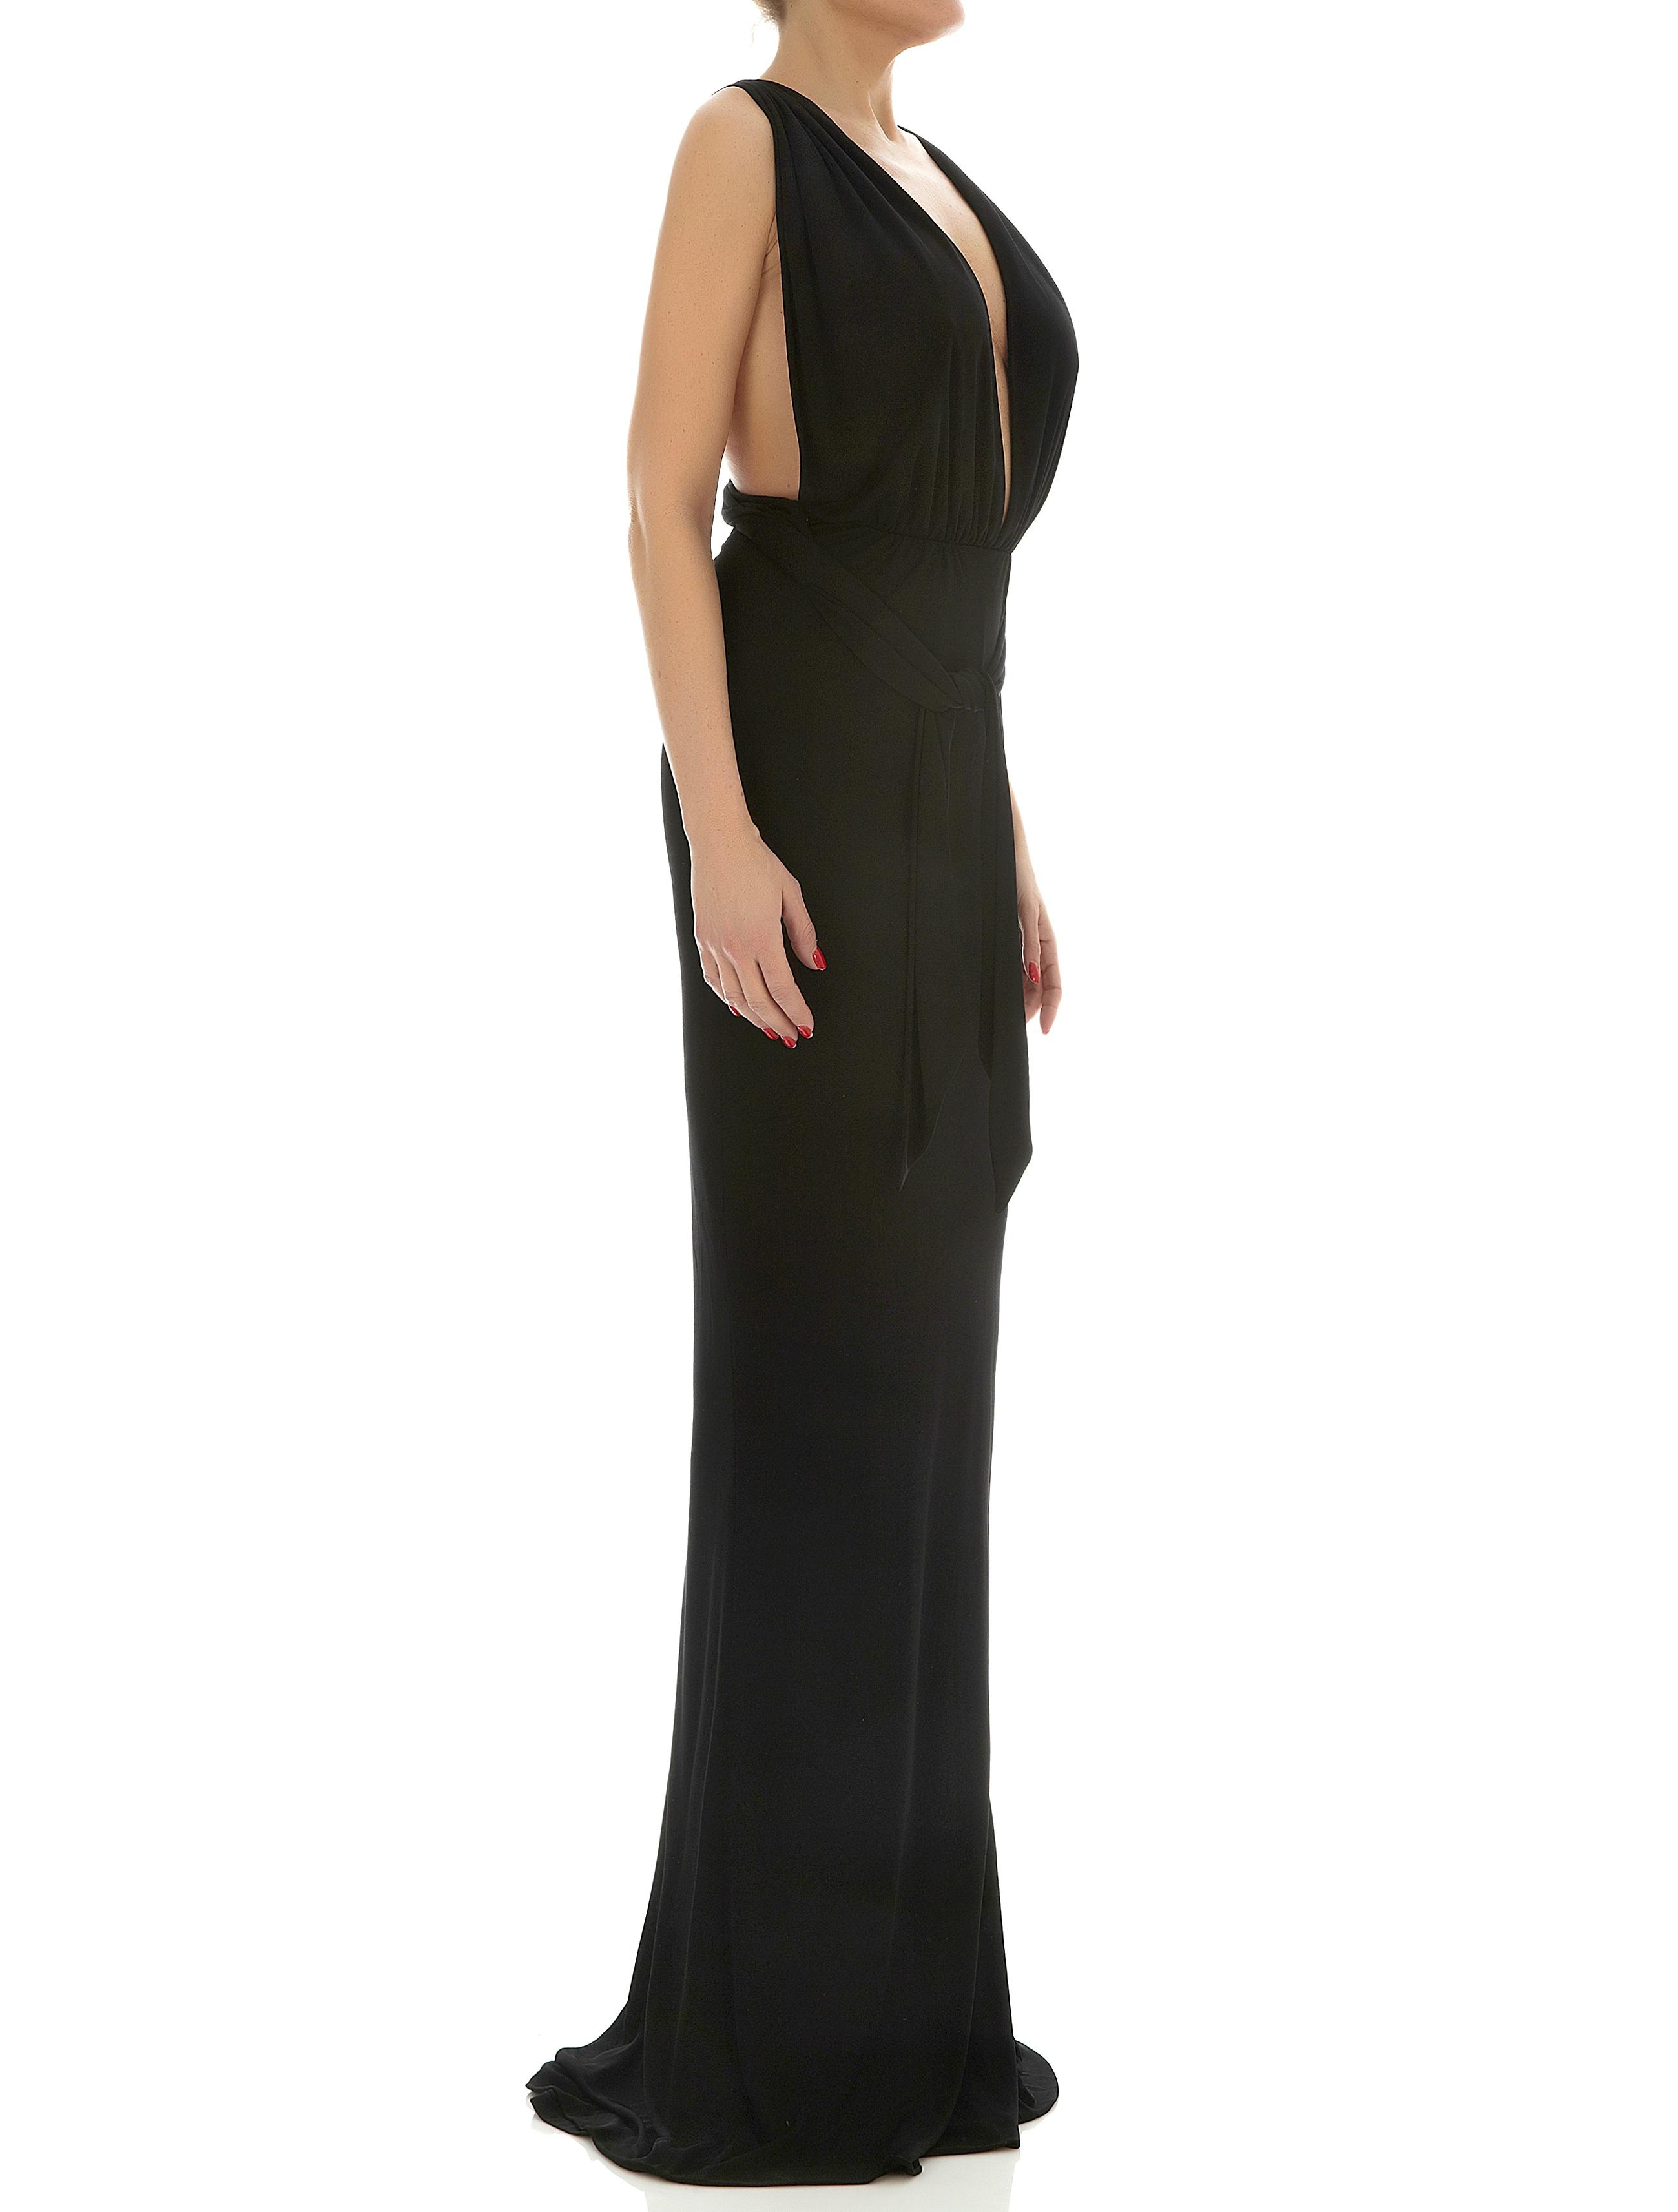 Azarro evening long dress, από 4.350 ευρώ, στο 1vintagedress.com, 1.600 ευρώ